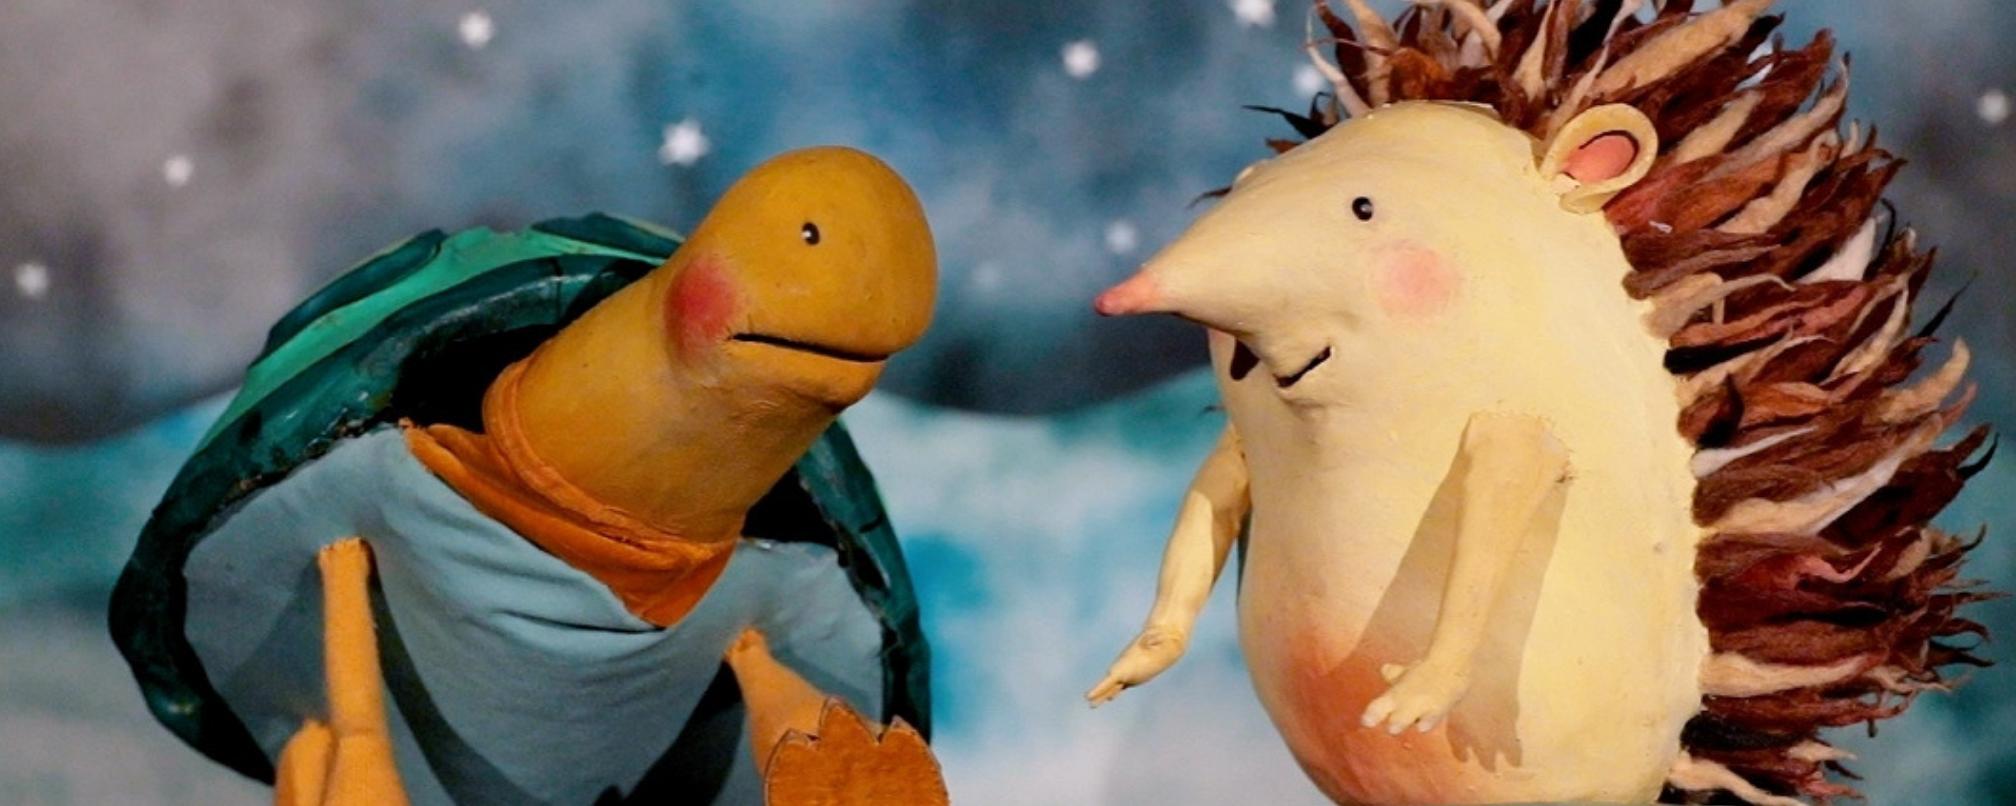 Hedgehog and tortoise puppet